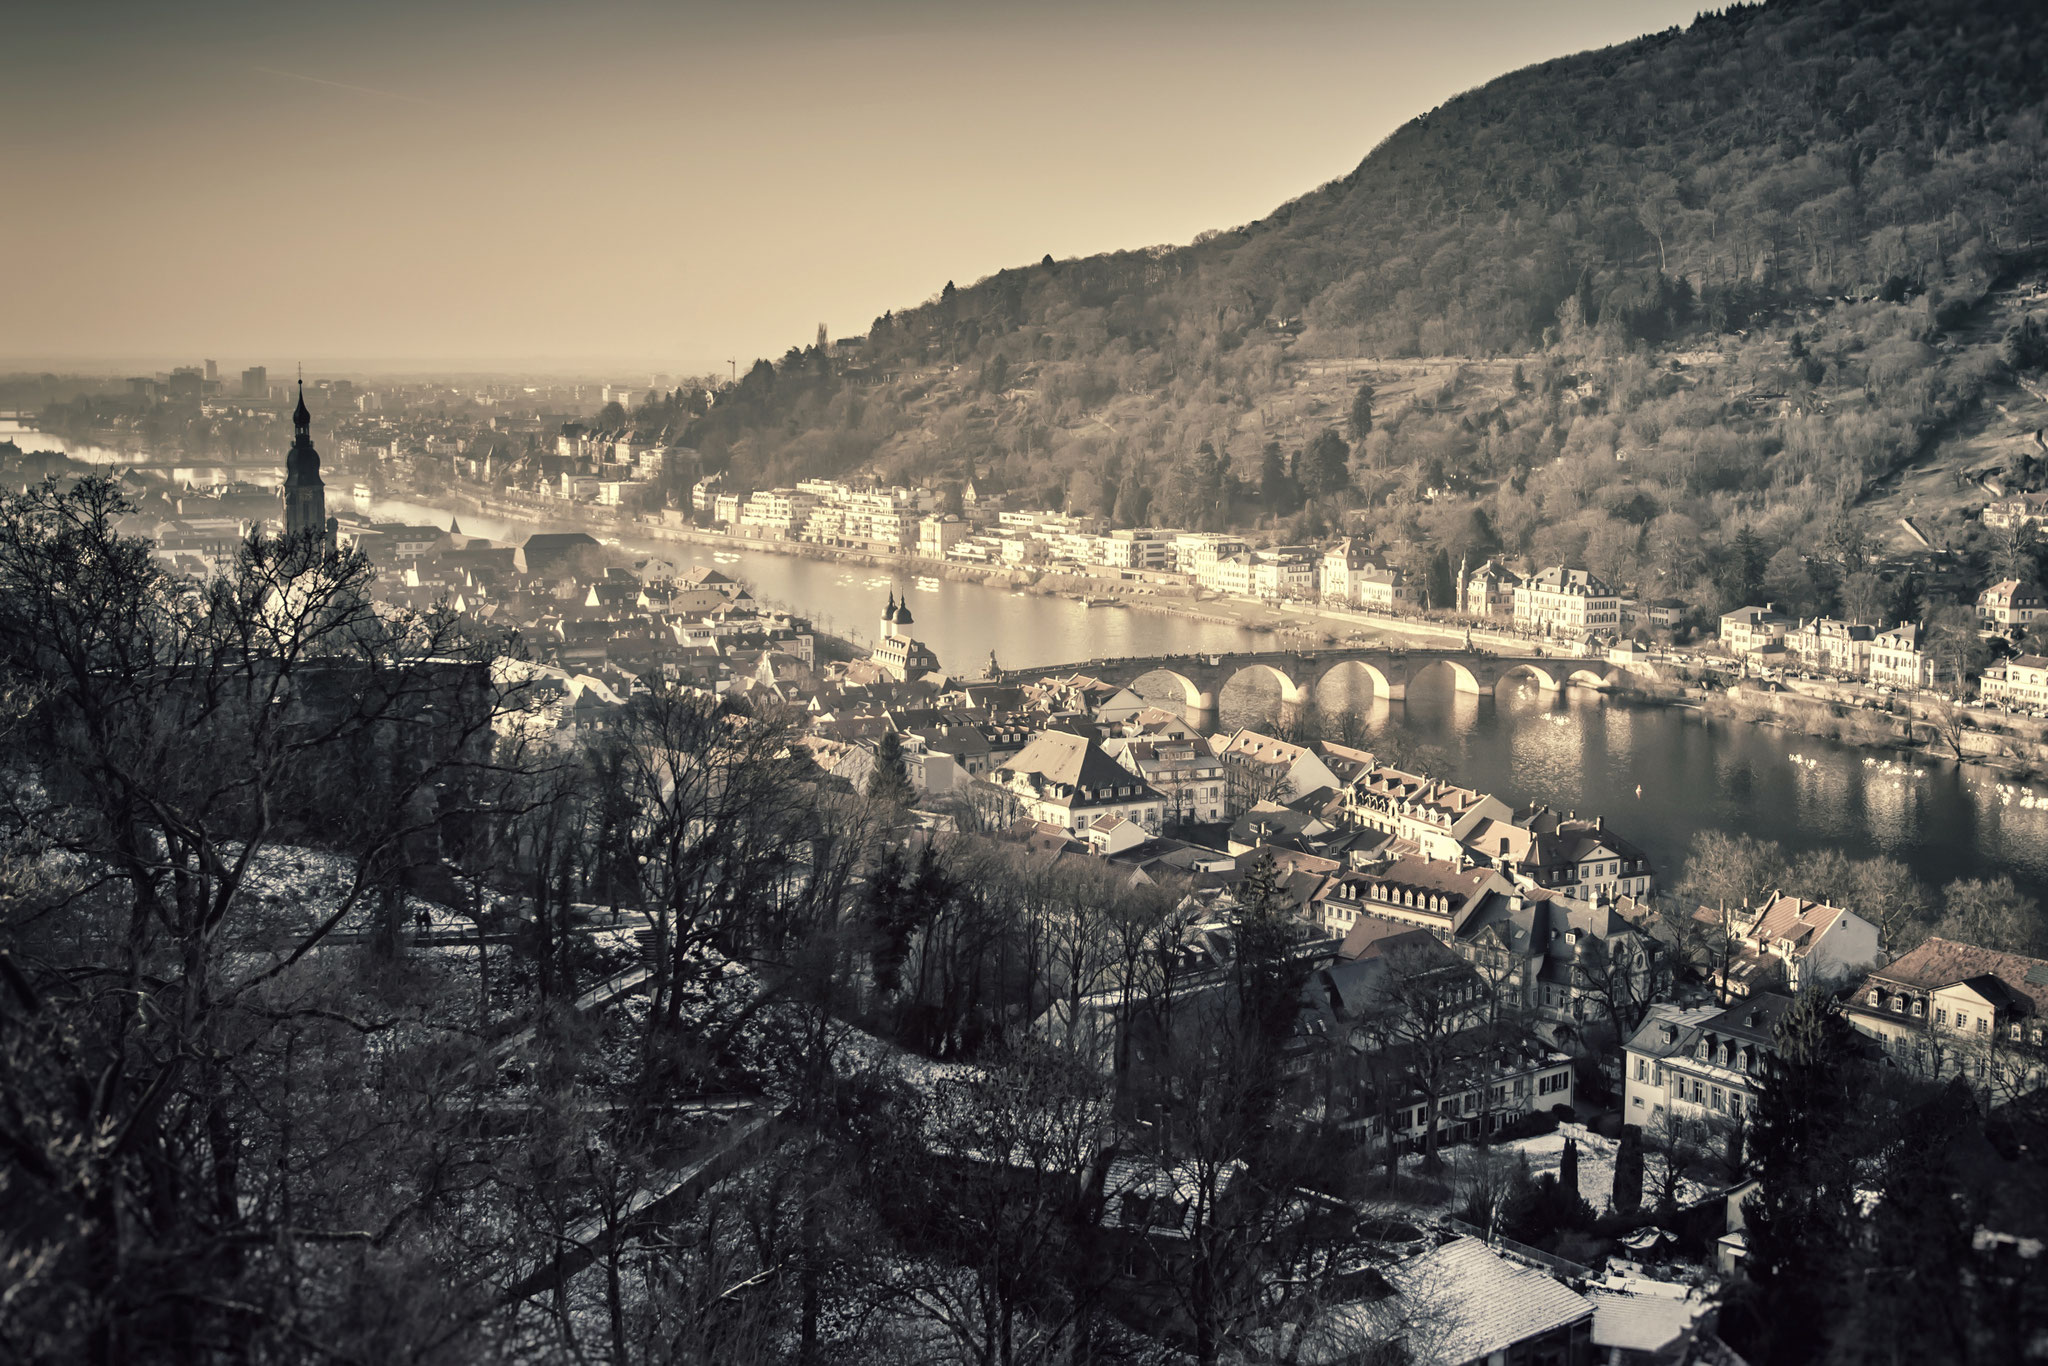 033-BÁN József (Valea lui Mihai-RO) - Heidelberg (DE)